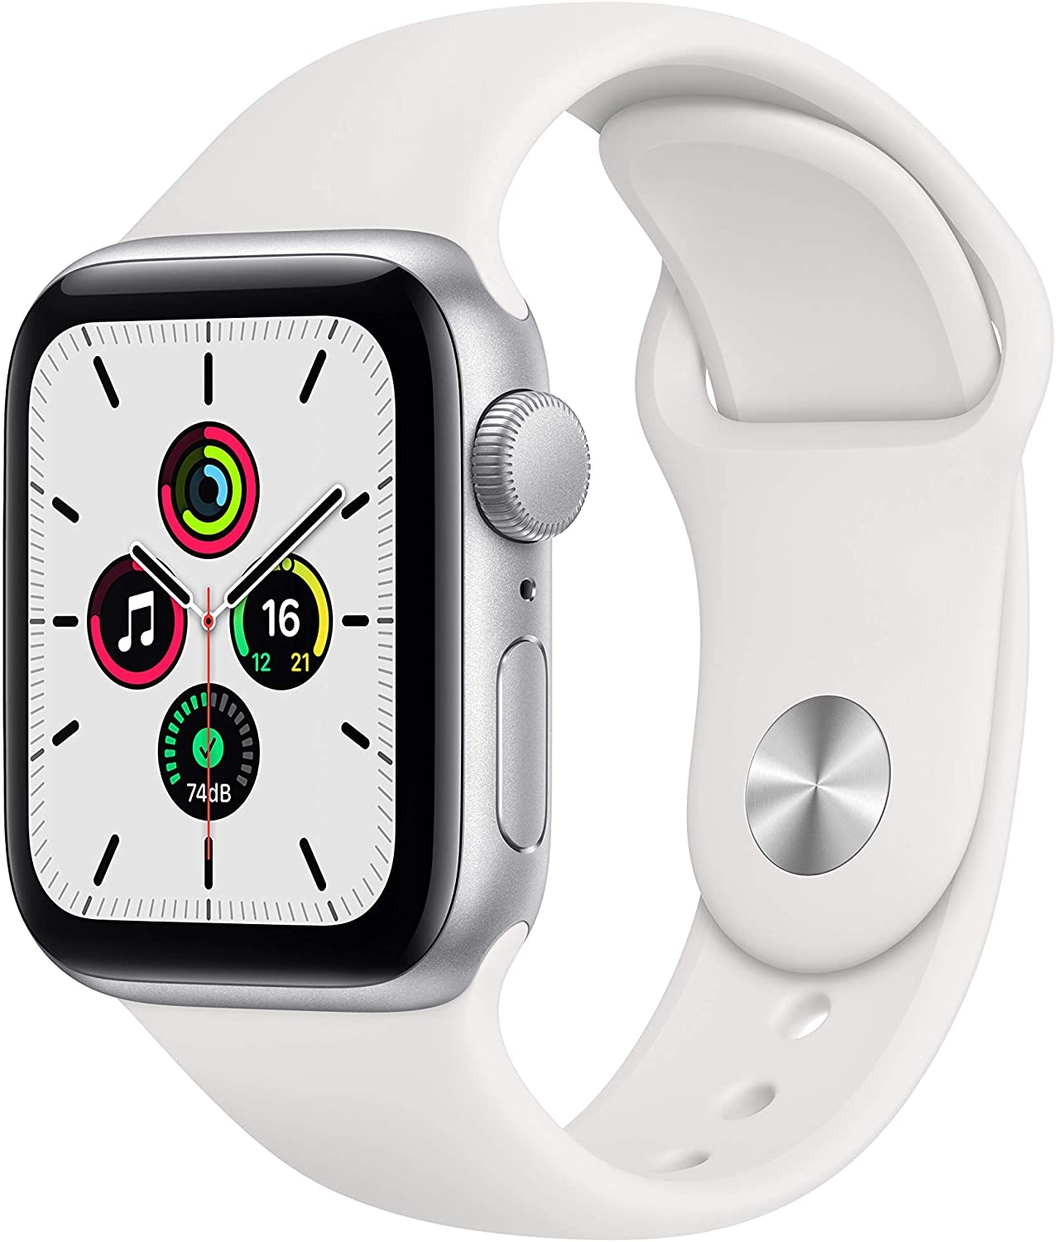 Apple(アップル) Apple Watch SE(GPSモデル) MYDM2J/Aの商品画像